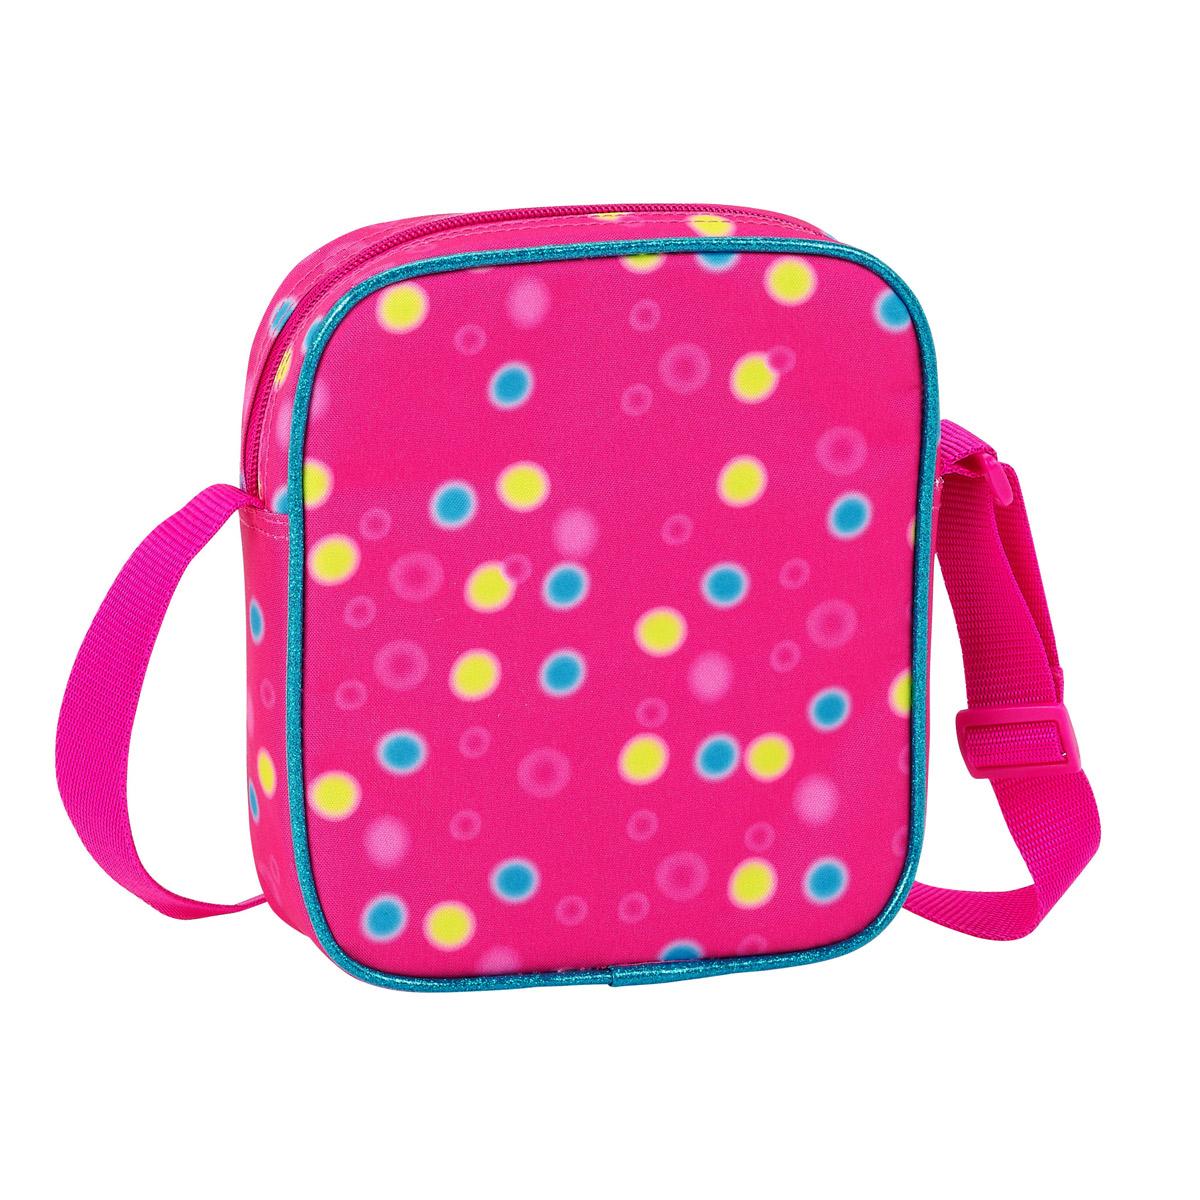 Trolls Rainbow Small Shoulder Bag – image 2